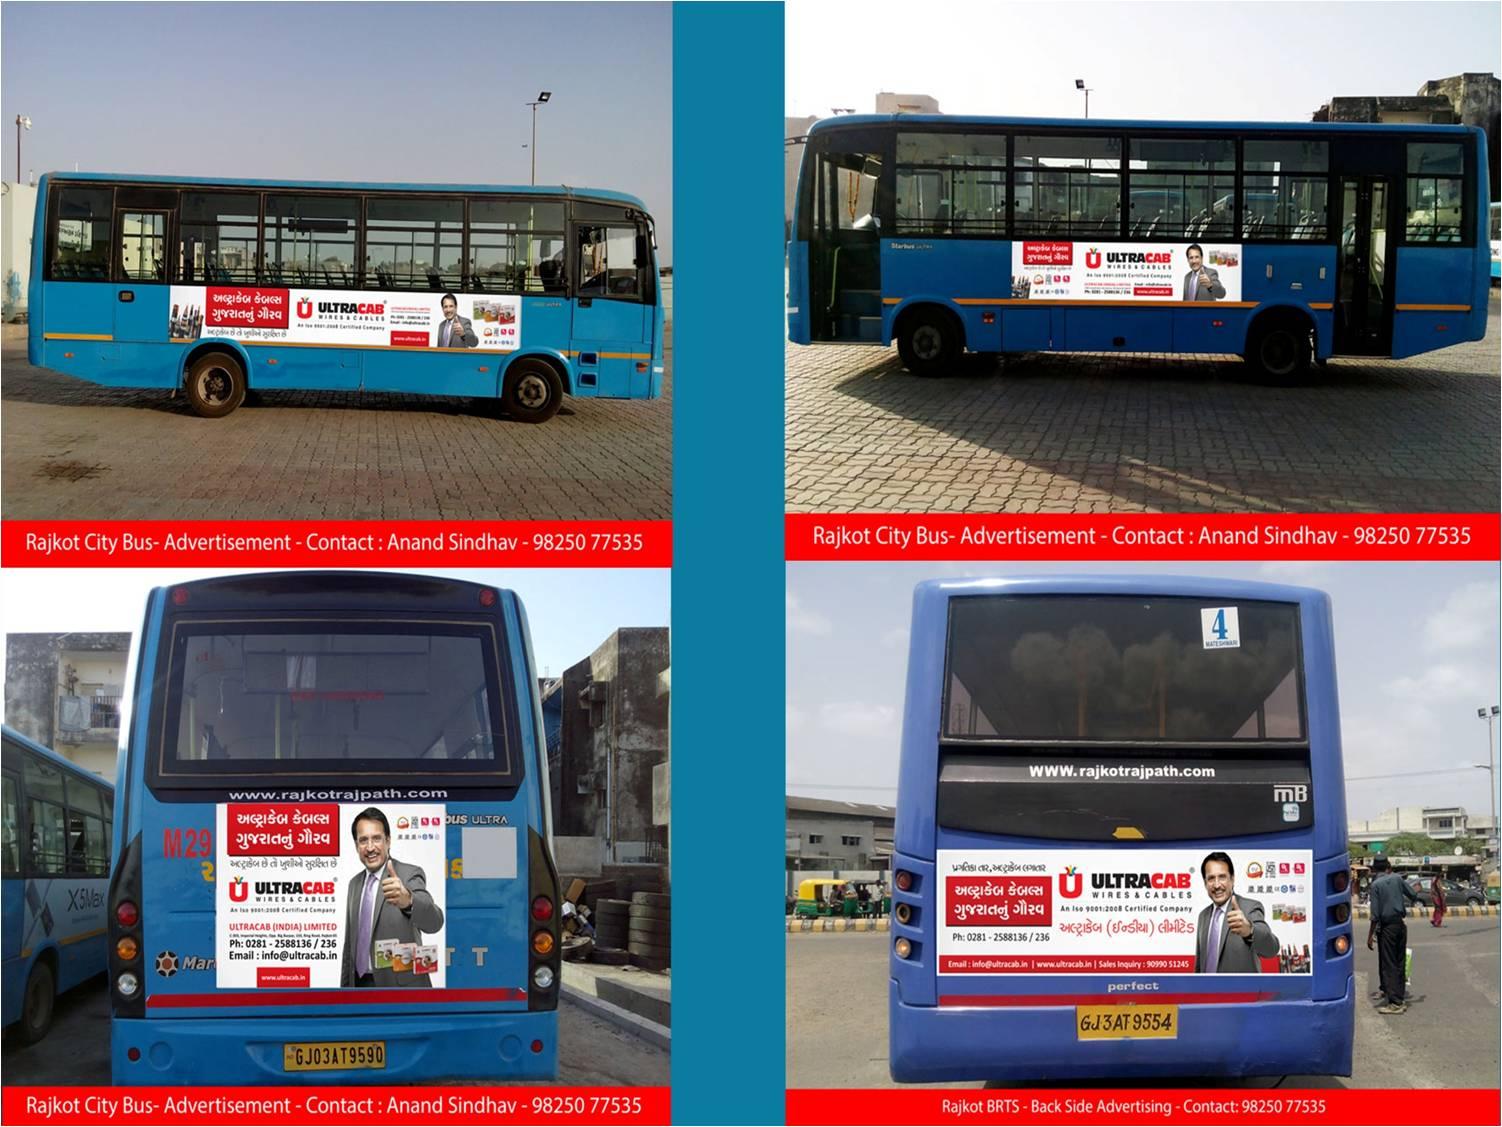 Rajkot city Bus